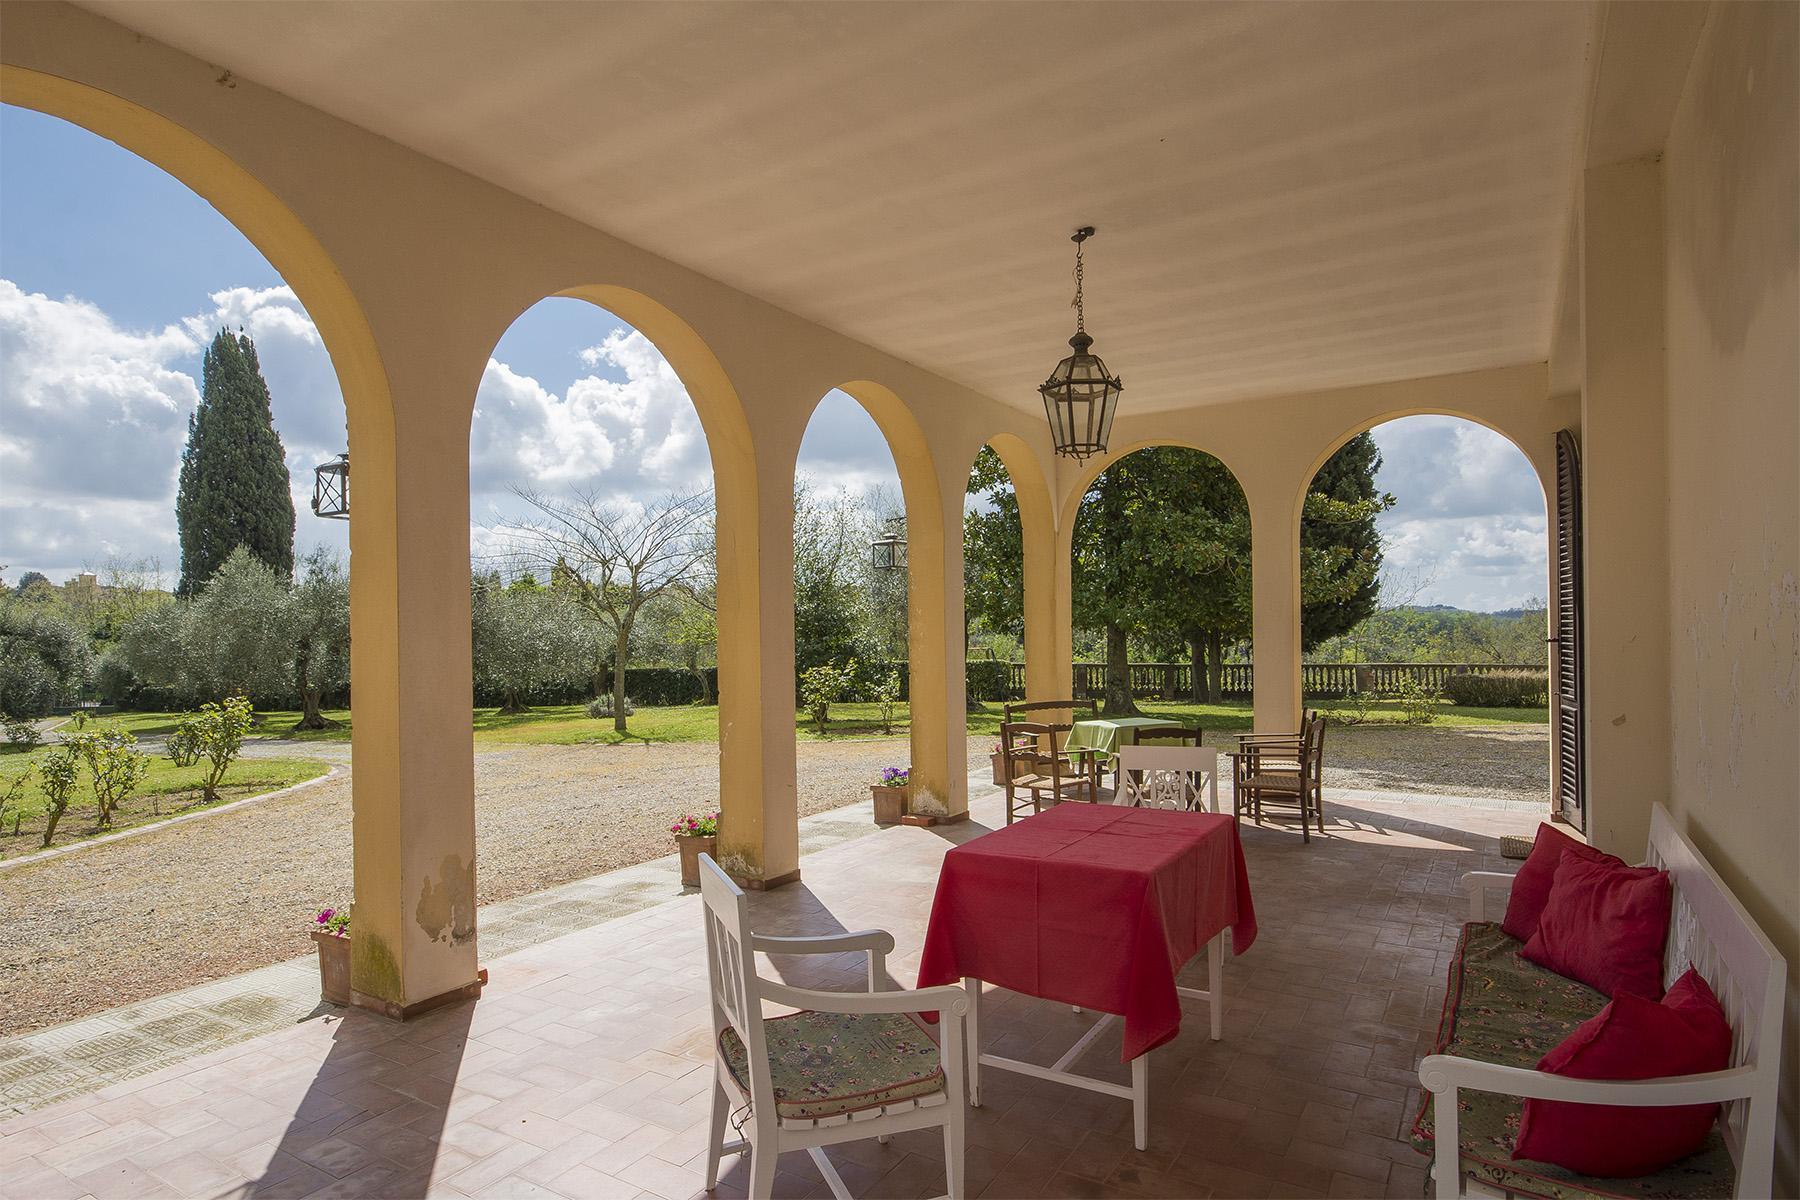 Elégante villa sur les collines toscanes - 6